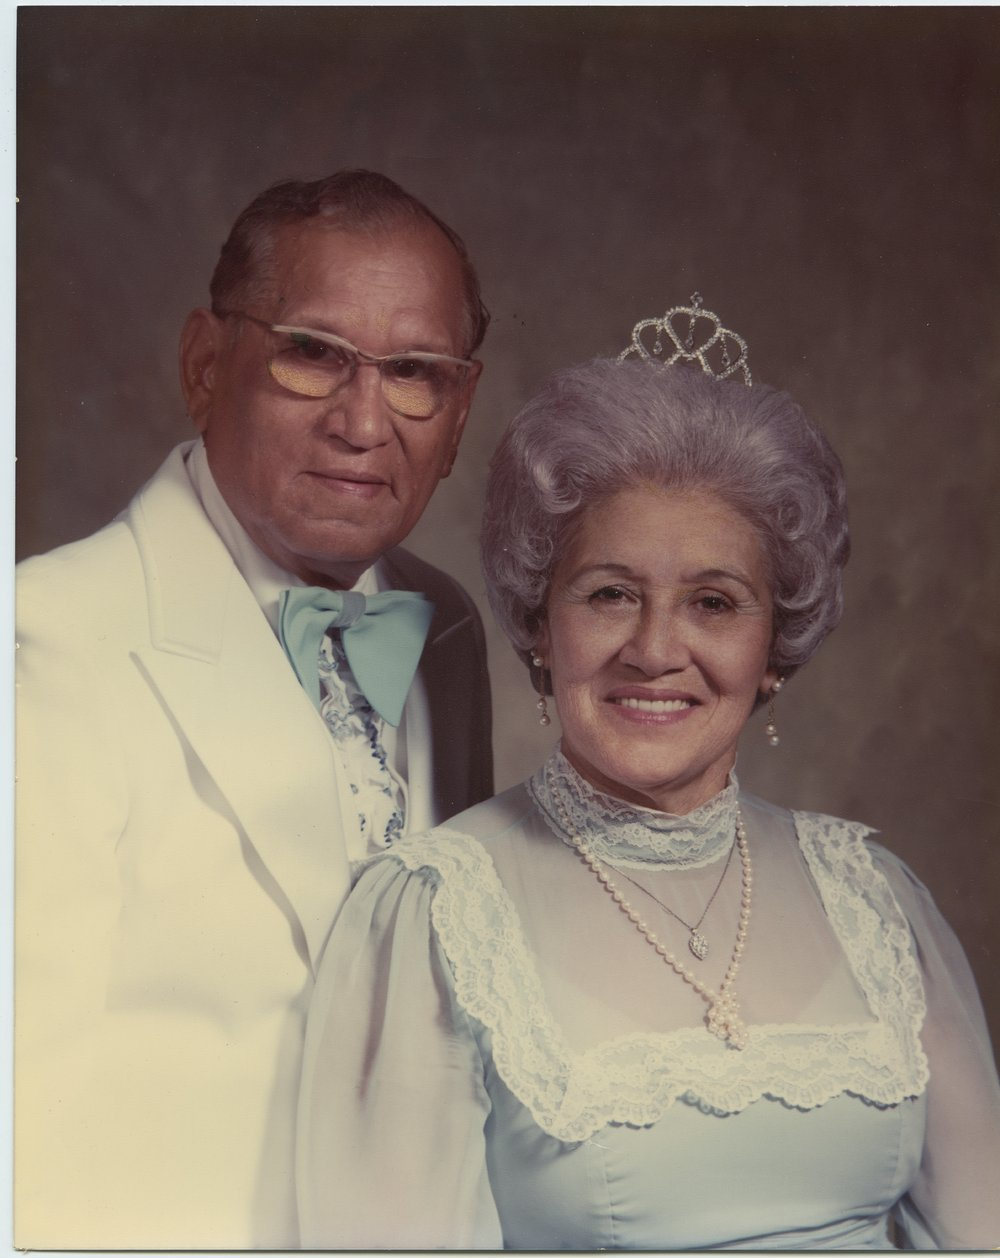 Atanacio and Jane (Juana Gonzales) Corona married in 1978